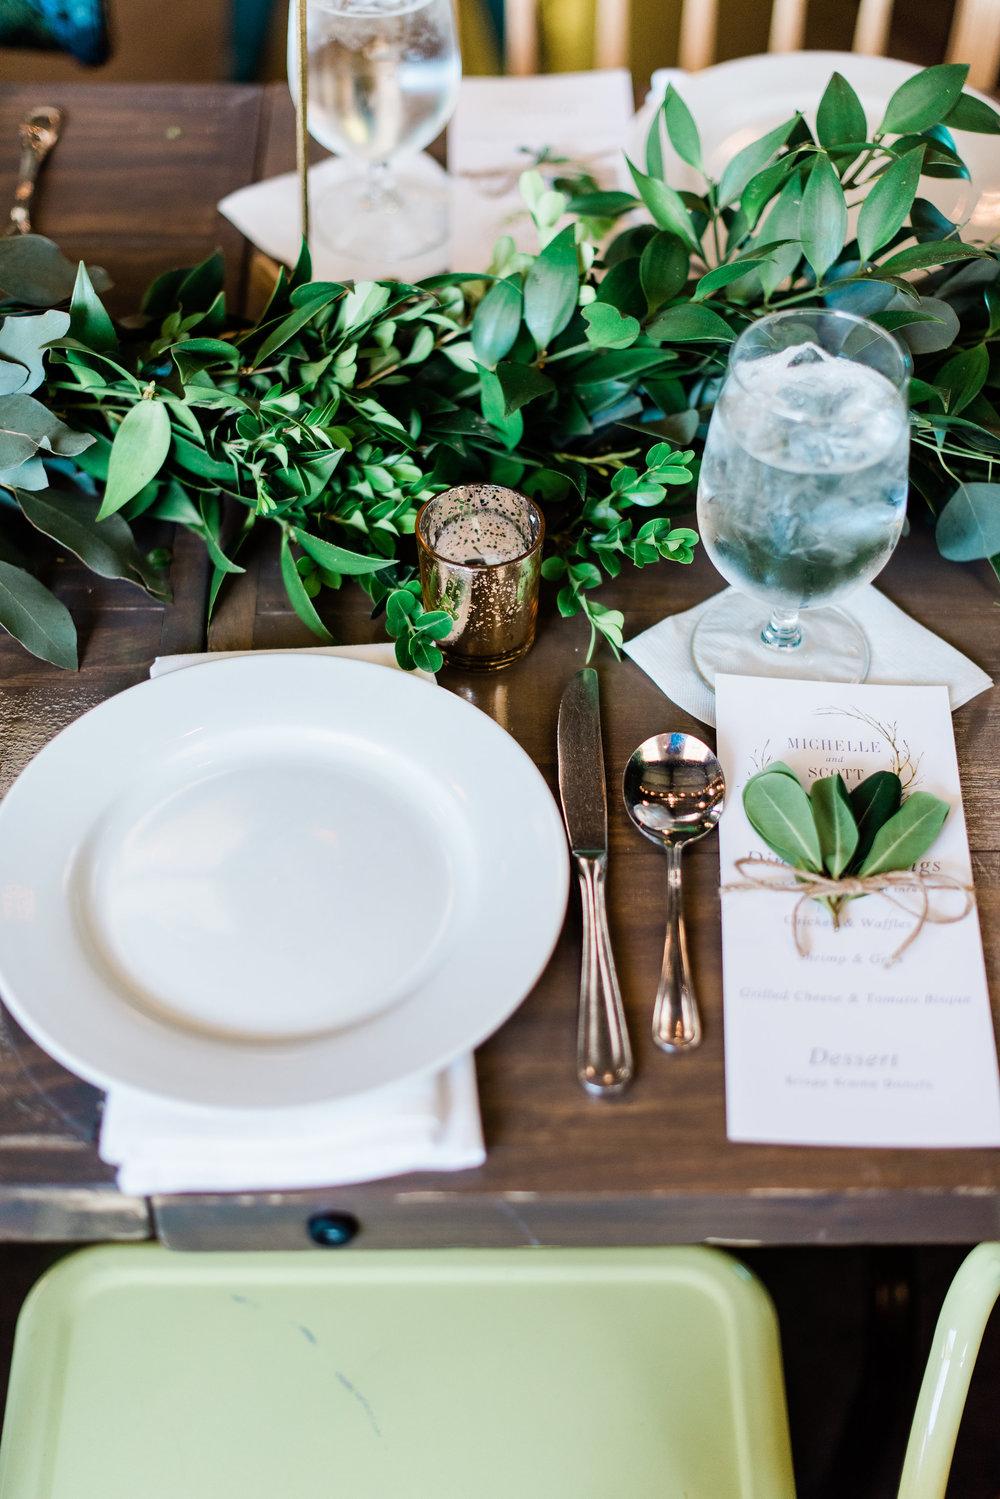 savannah-bridal-shop-savannah-florist-savannah-wedding-planner-michelle-and-scott-apt-b-photography-soho-south-cafe-wedding-downtown-savannah-wedding-62.JPG